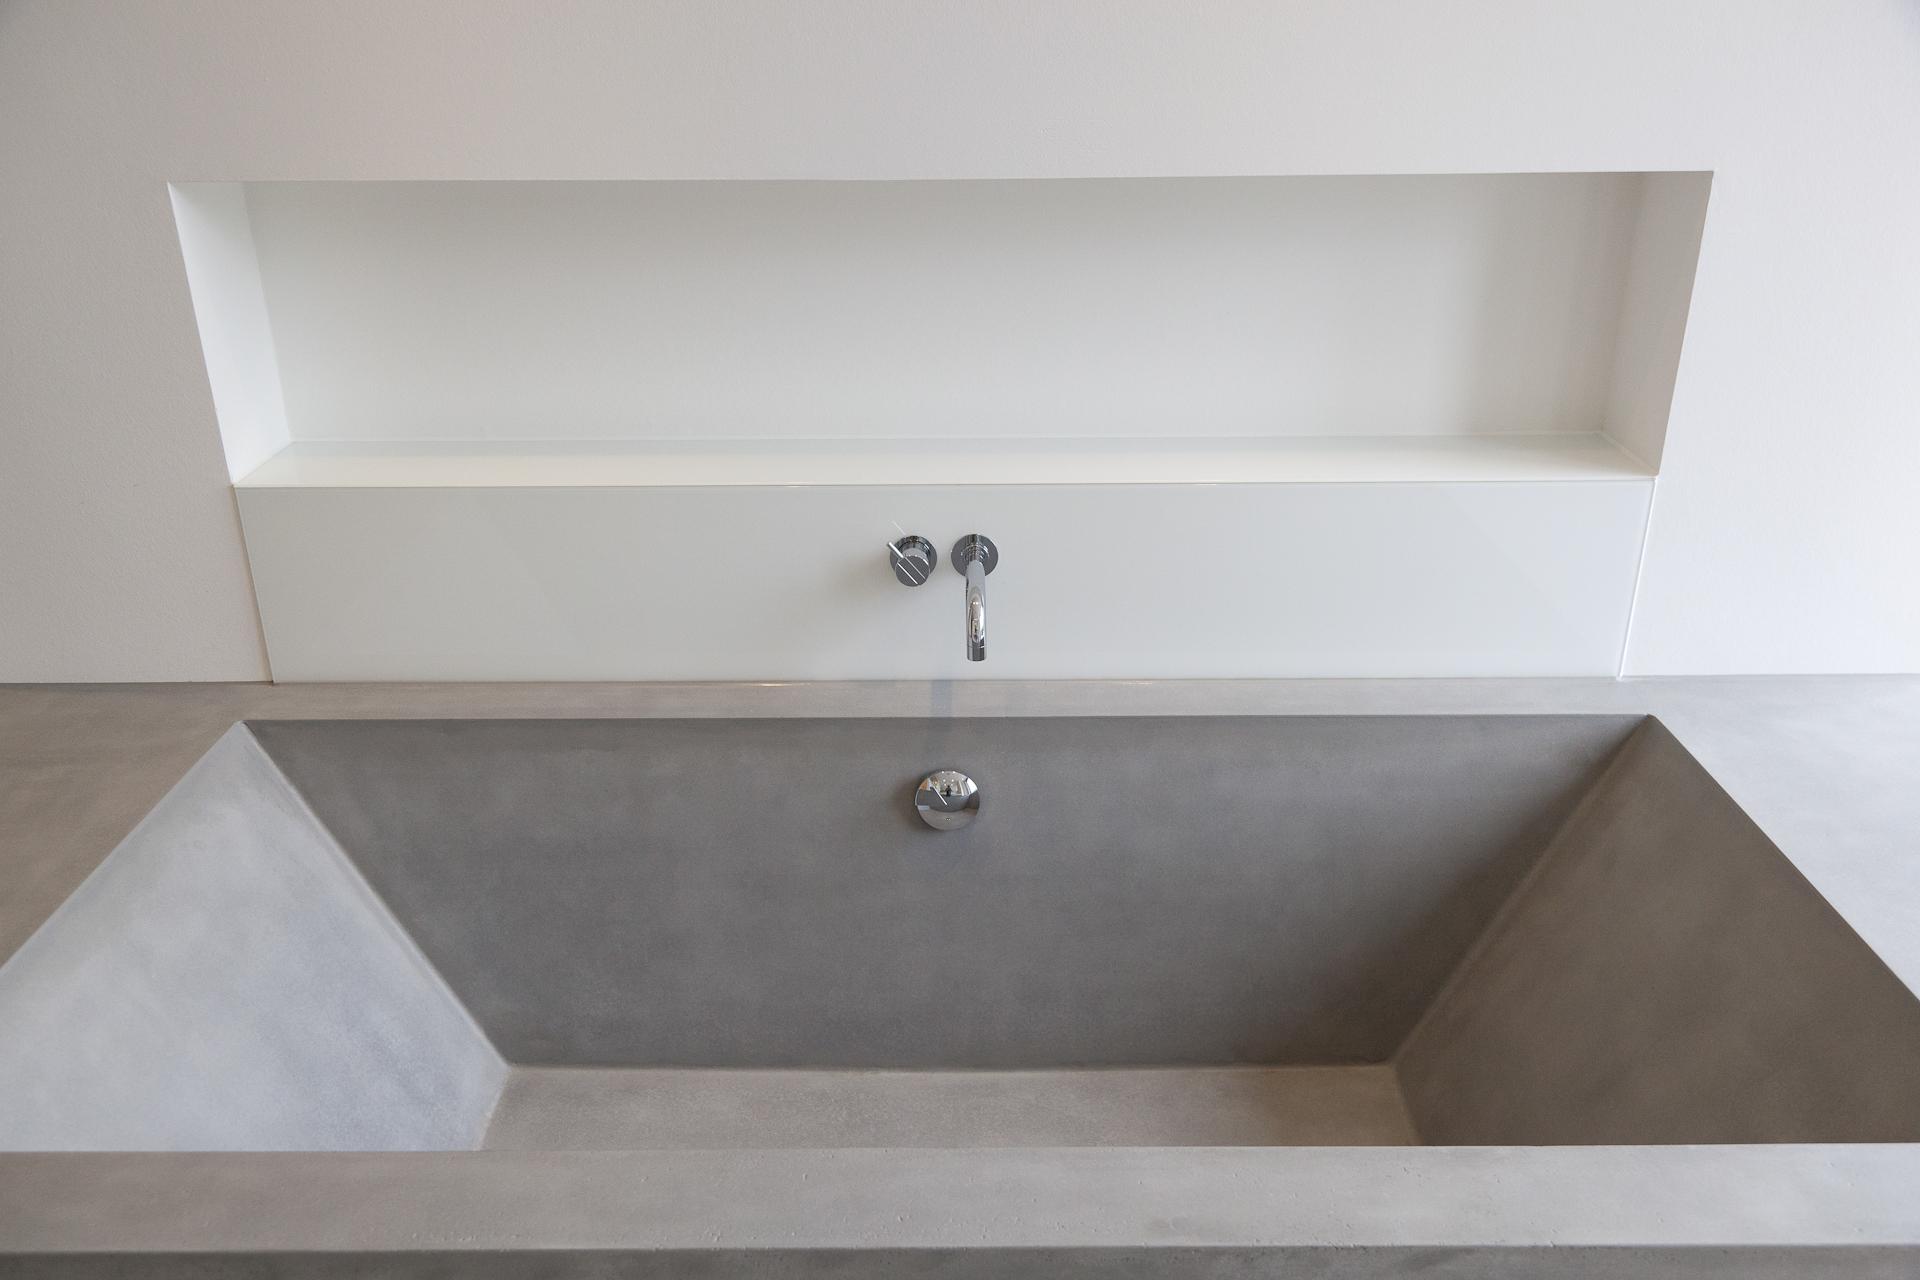 Peter_Leenders_Fotografie_Wrede_Architekten-21